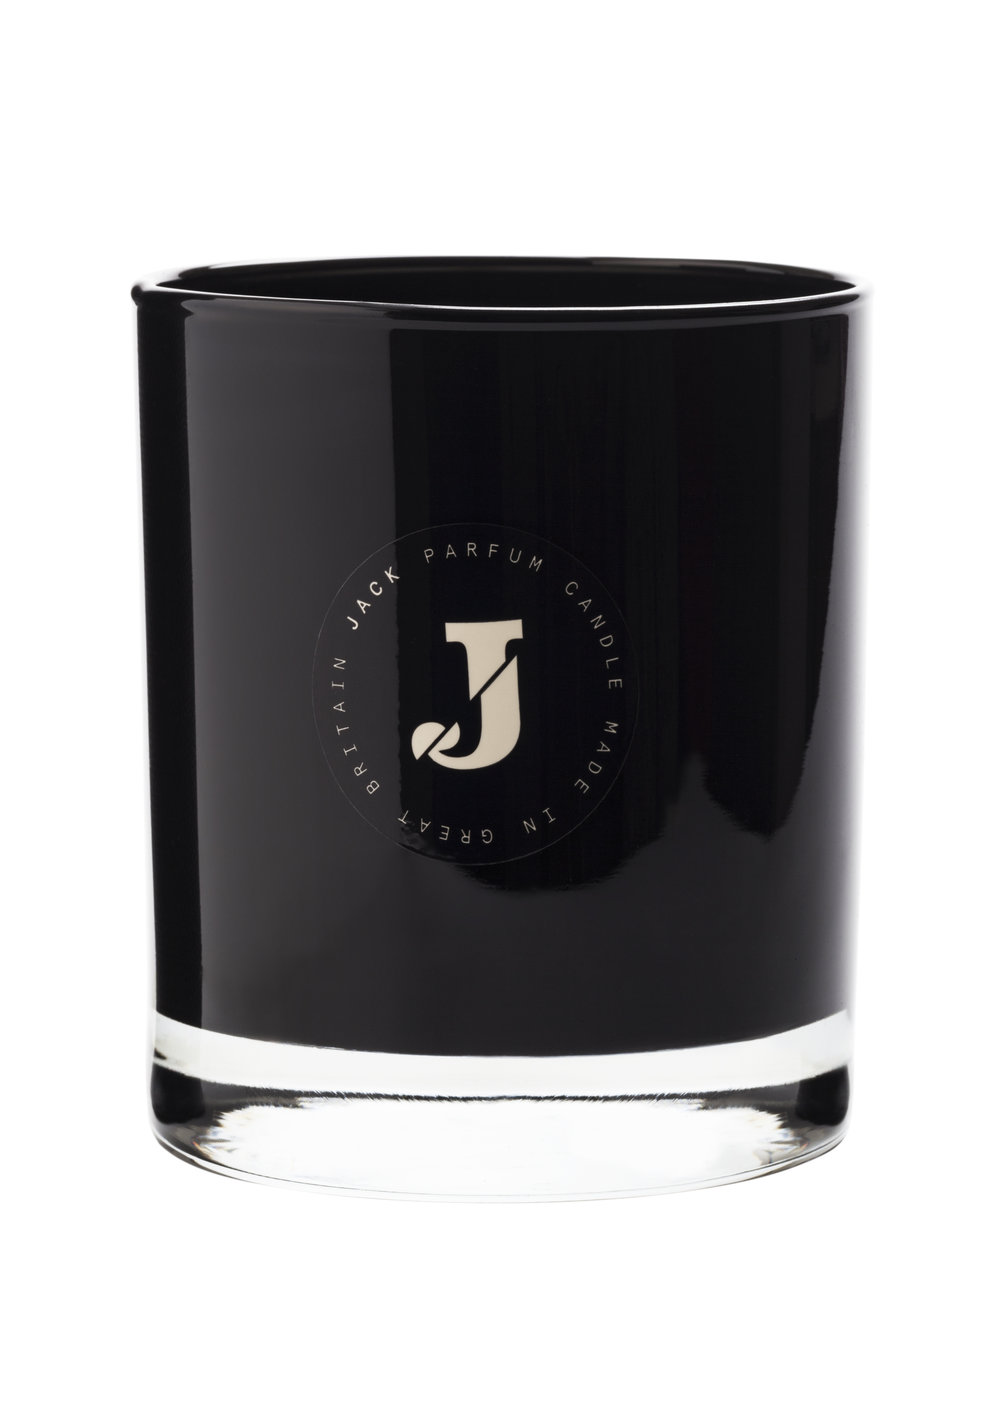 jack-candle.jpg